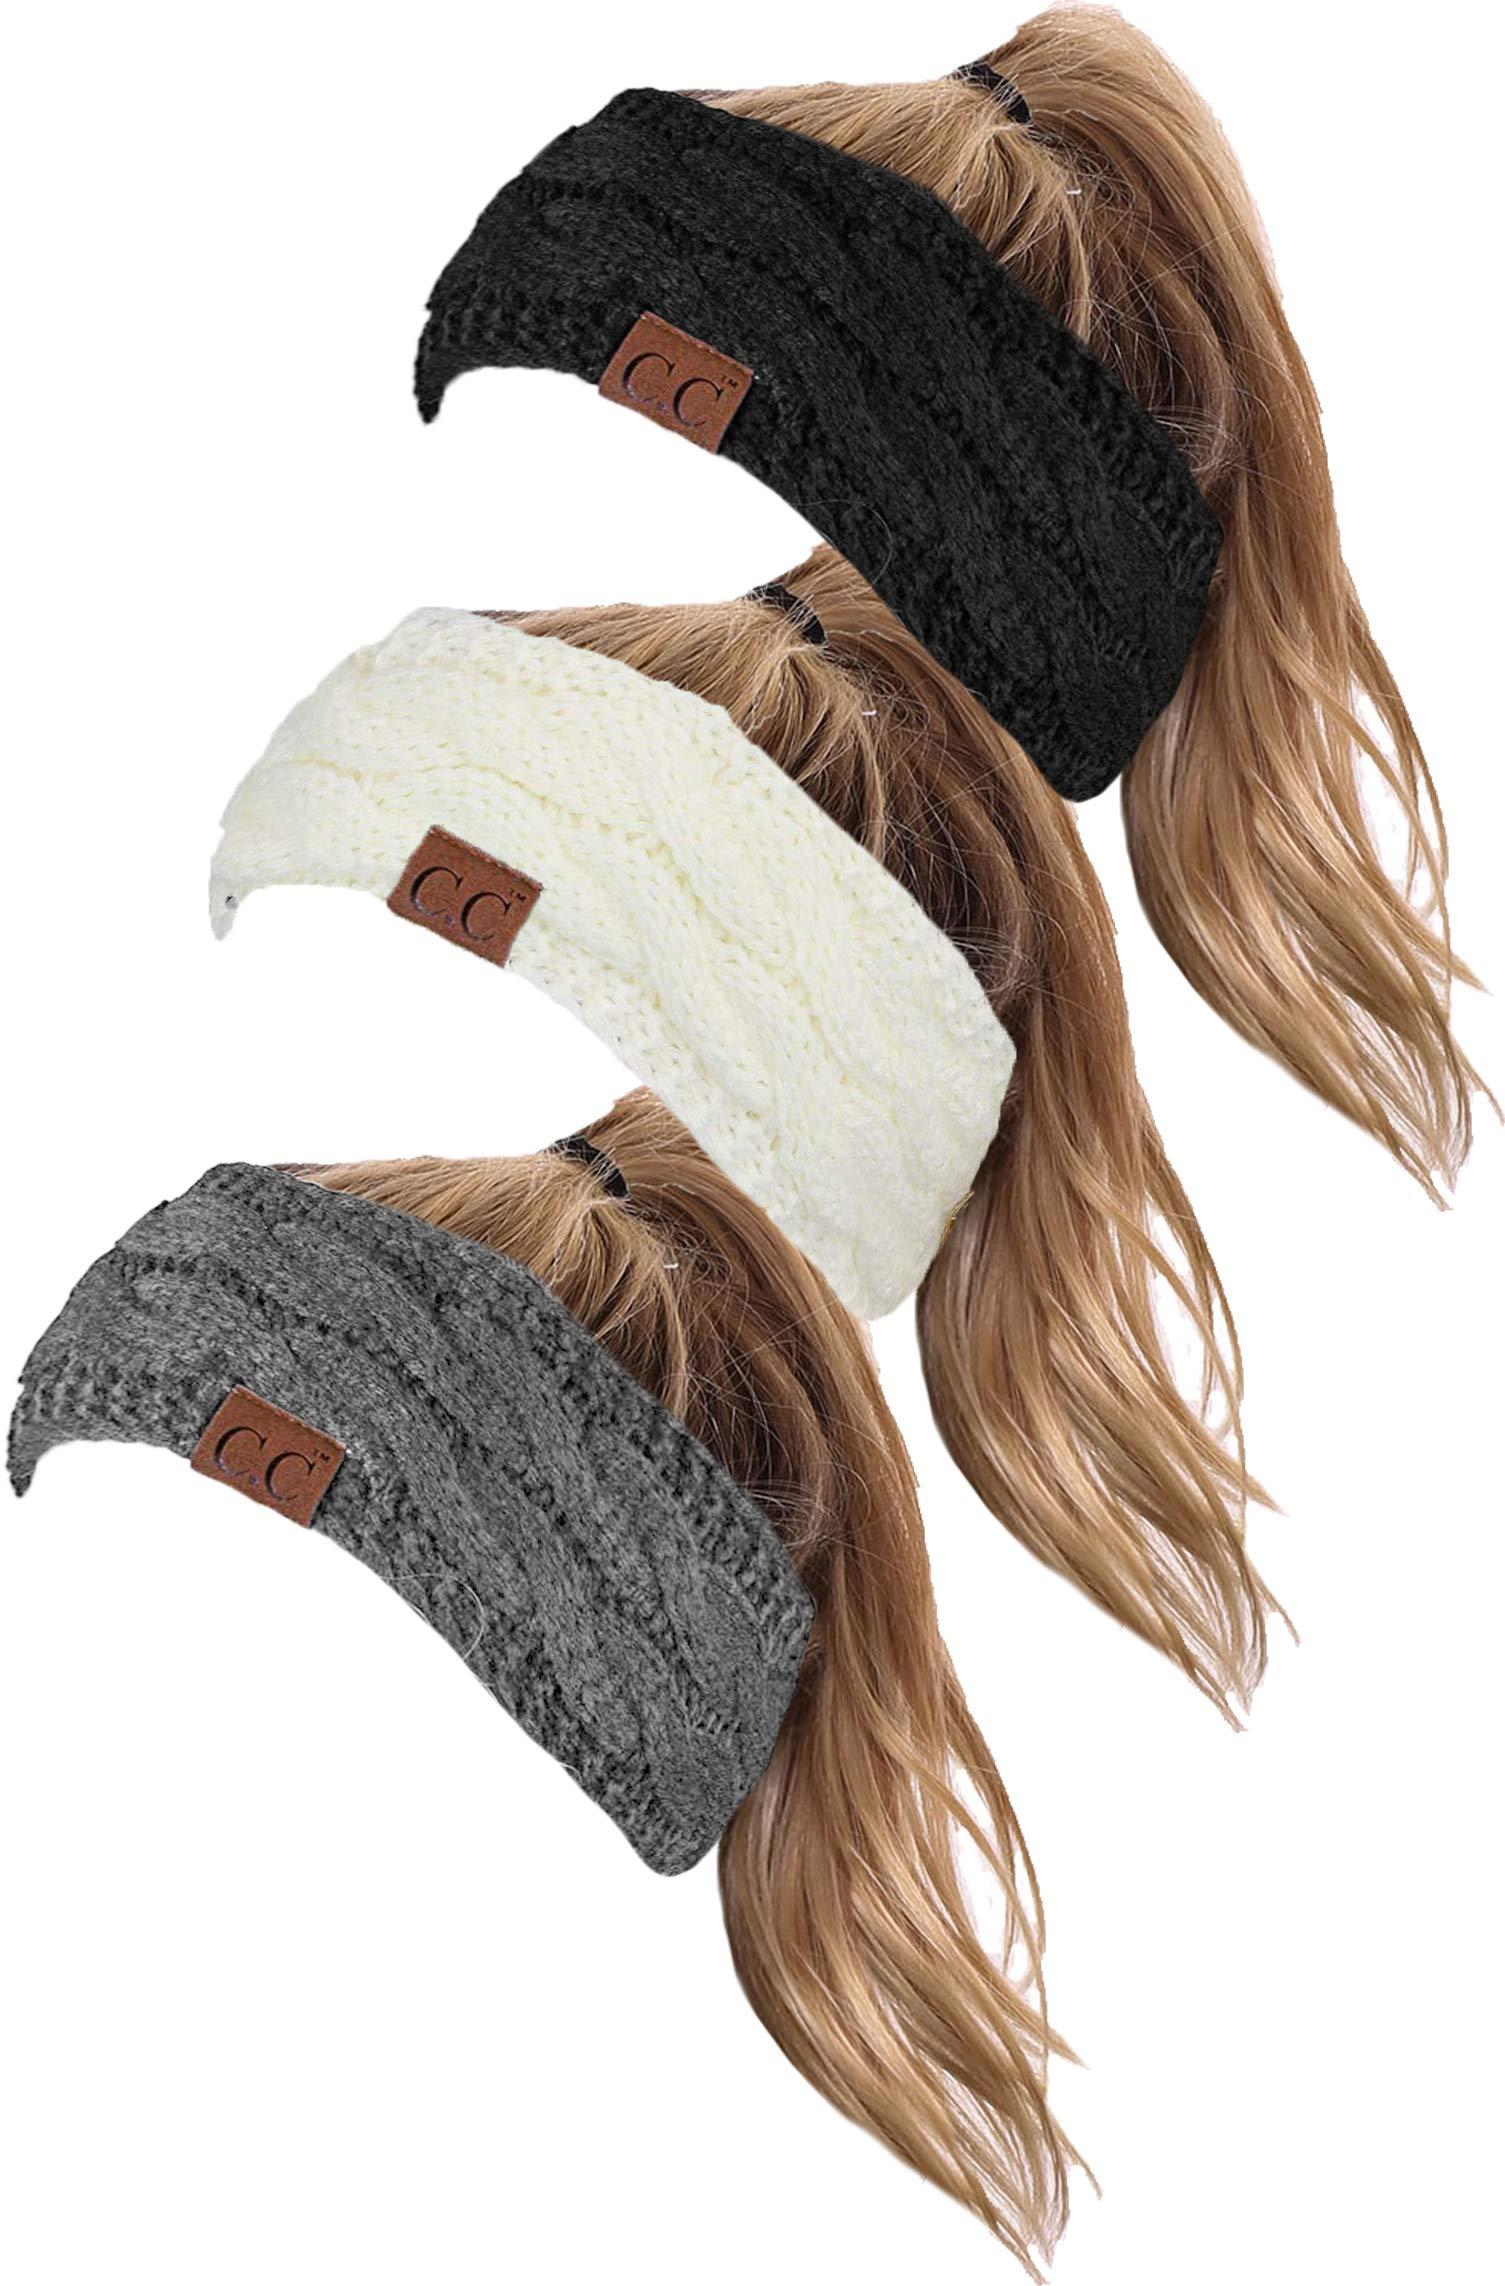 HW-6033-3-20a-062551 SOLID Headwrap Bundle - Black, Ivory, Heather Grey (3 Pack)